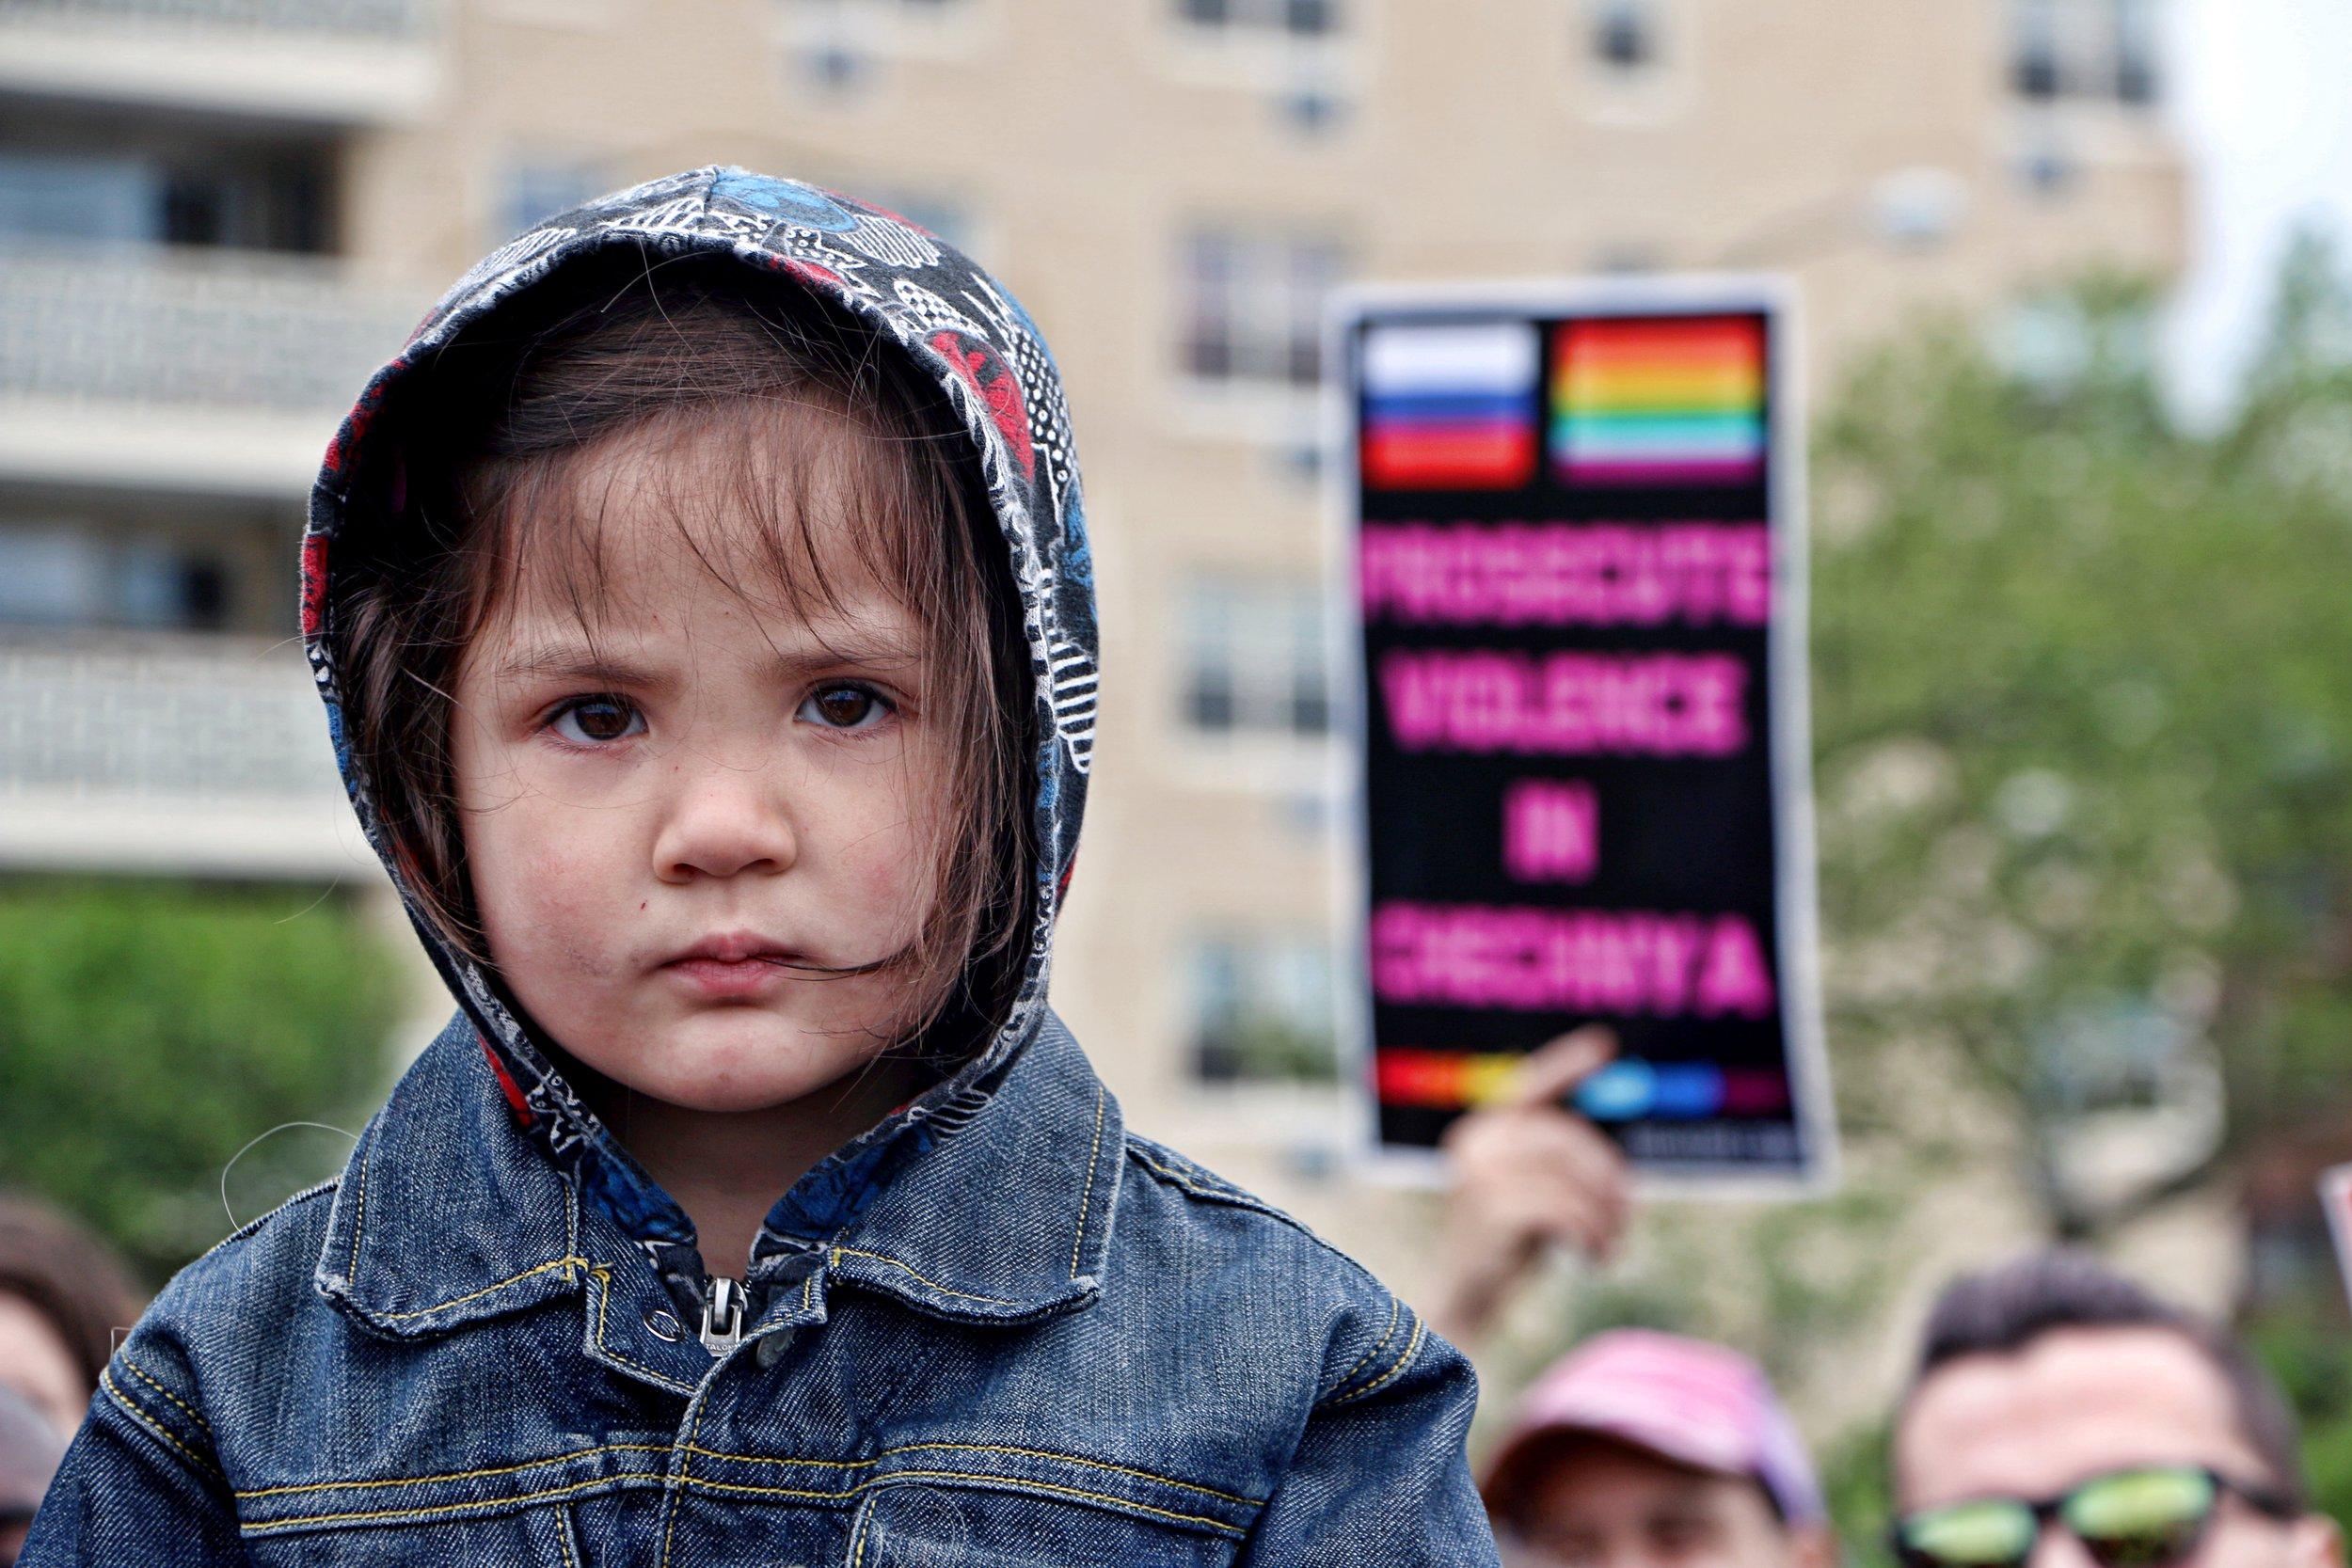 Brighton Beach Russian Pride. May 20th, 2017. New York City.